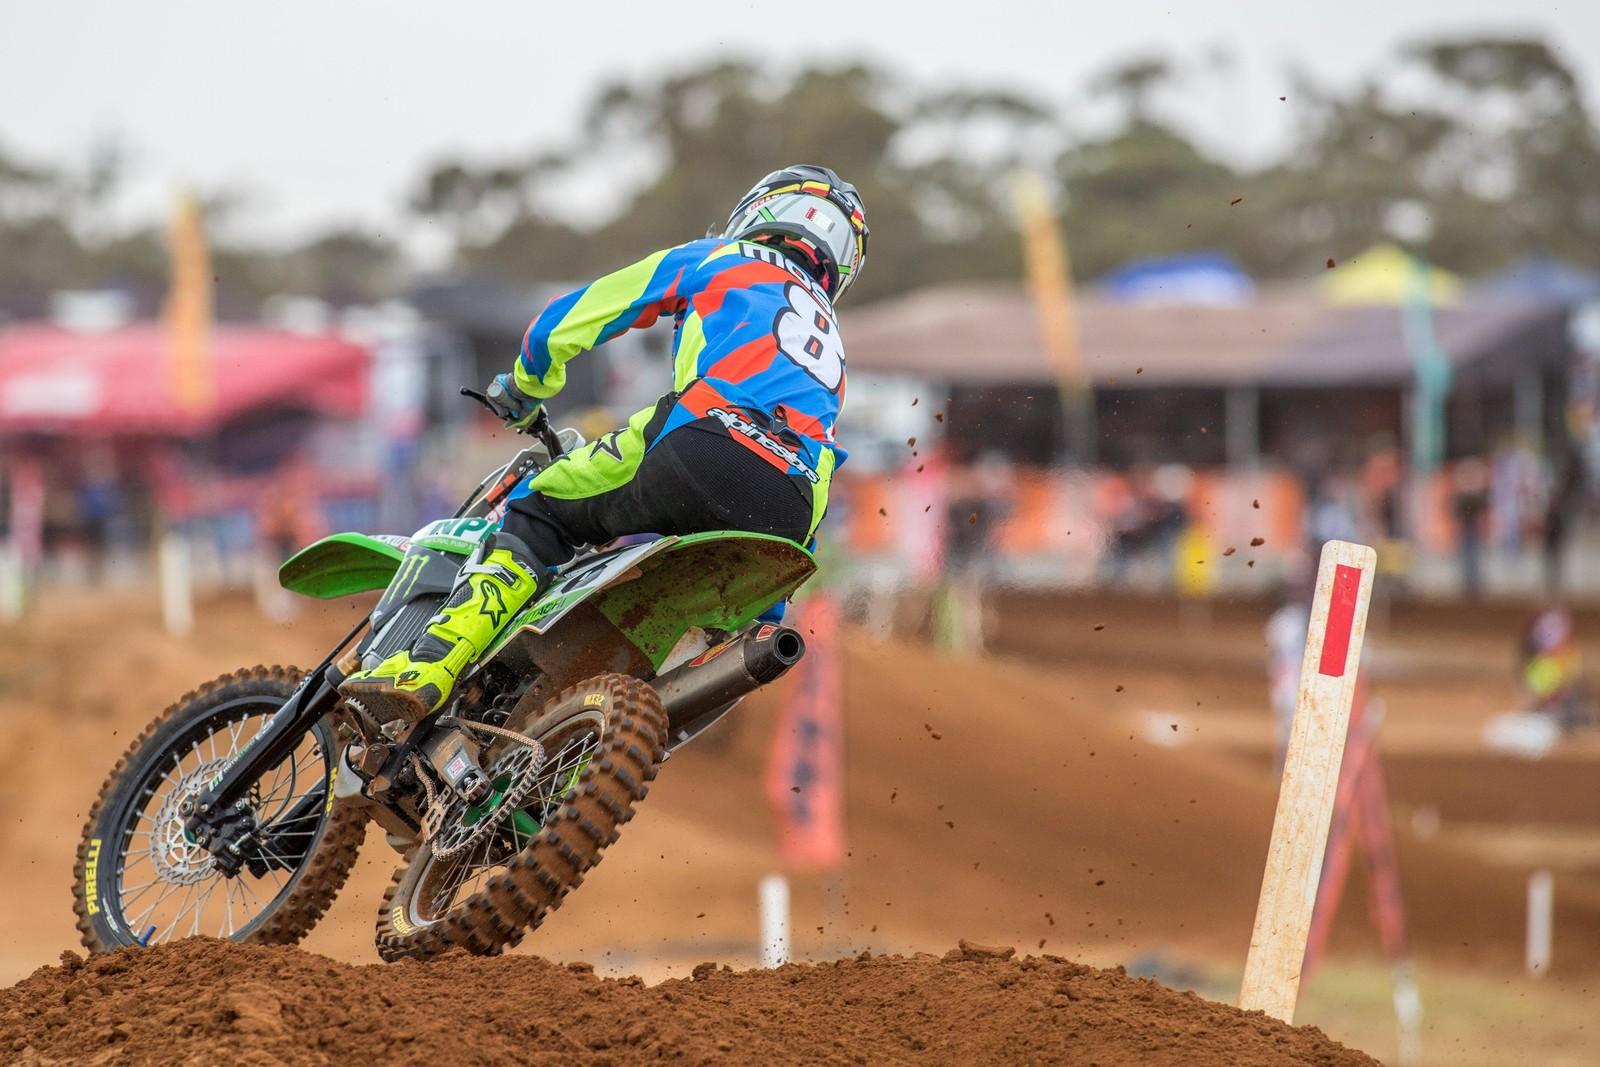 27 - Australian Motul Mx Championships: Round 4, Murray Bridge - Motocross Pictures - Vital MX